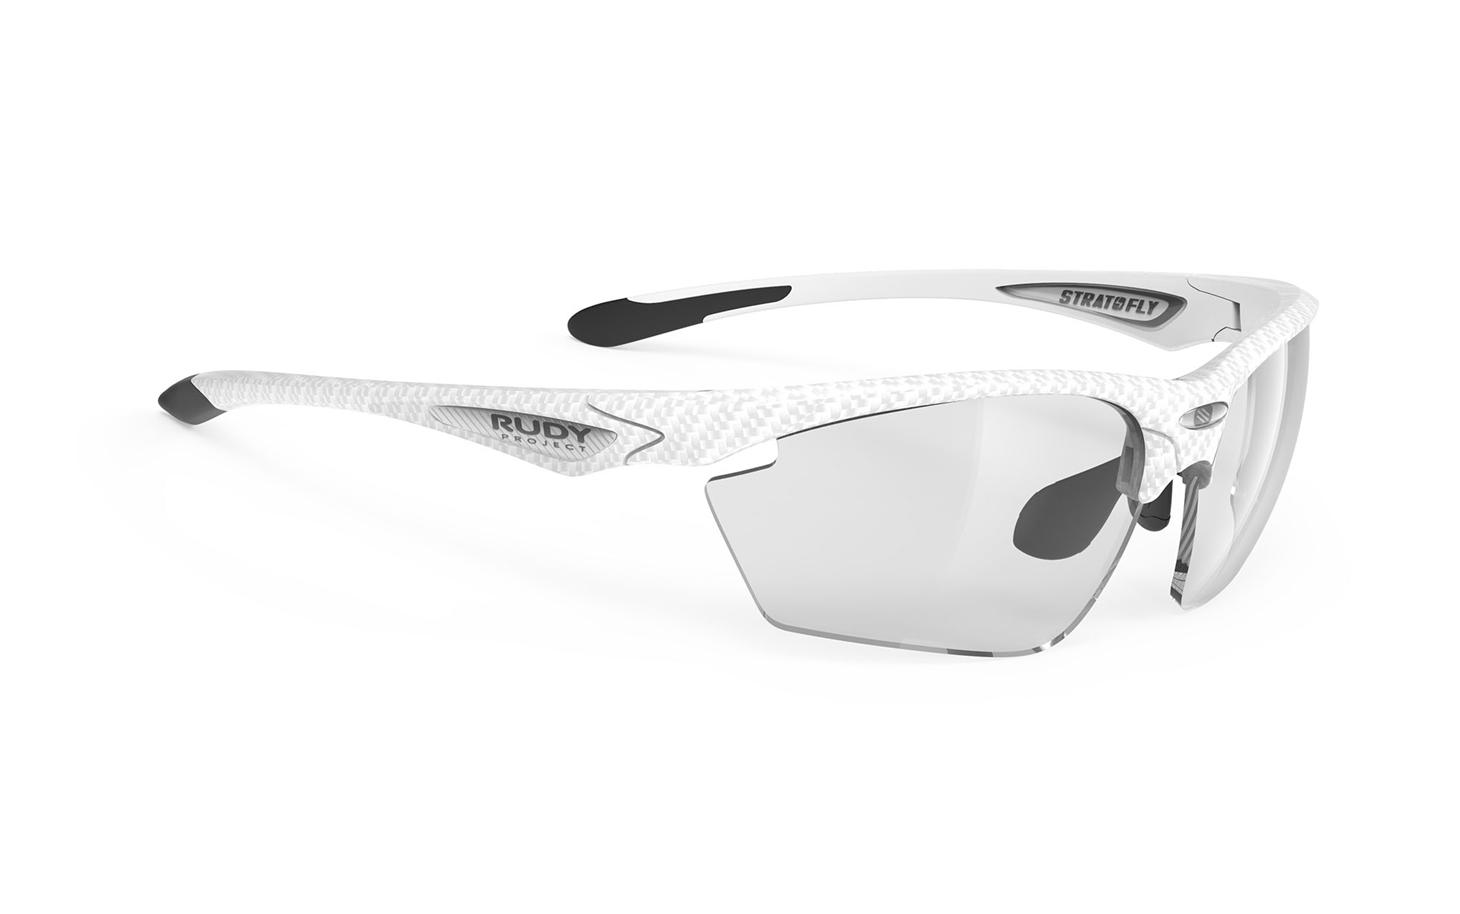 8f59fc21ea Performance Eyewear Stratofly - Rudy Project